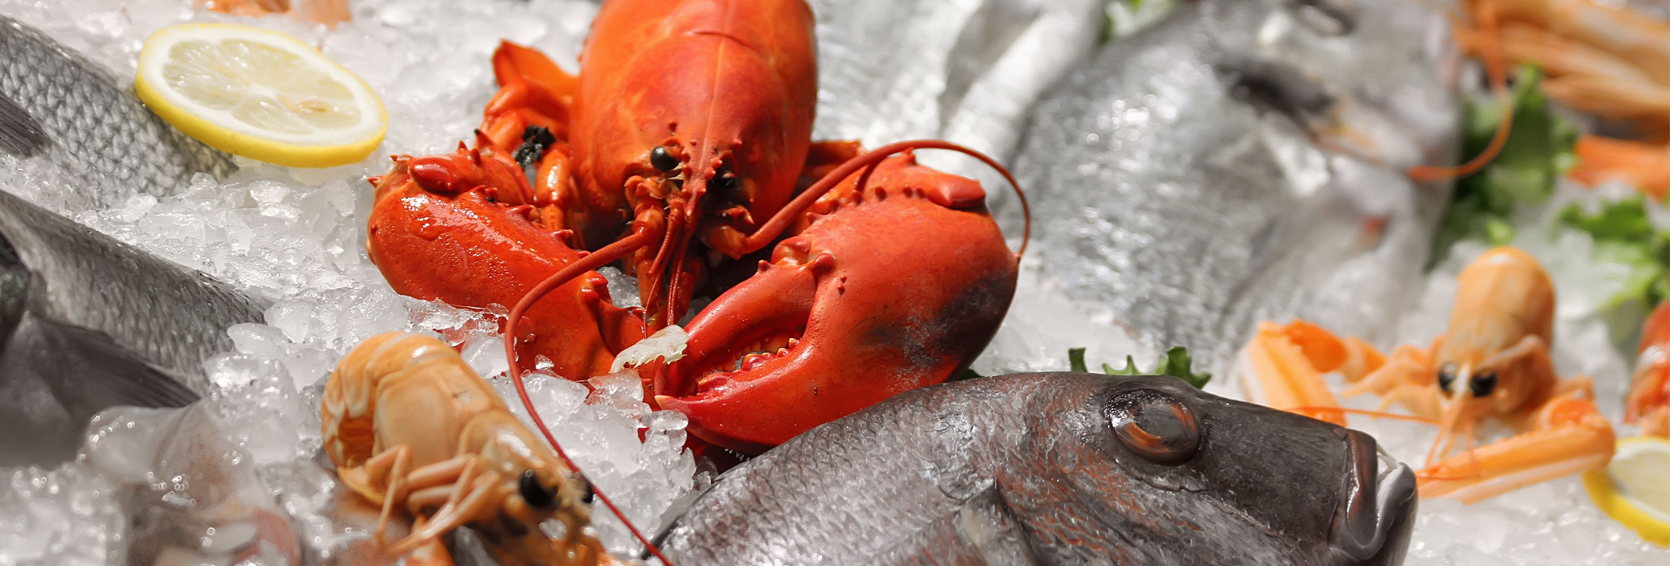 Seafood-Image